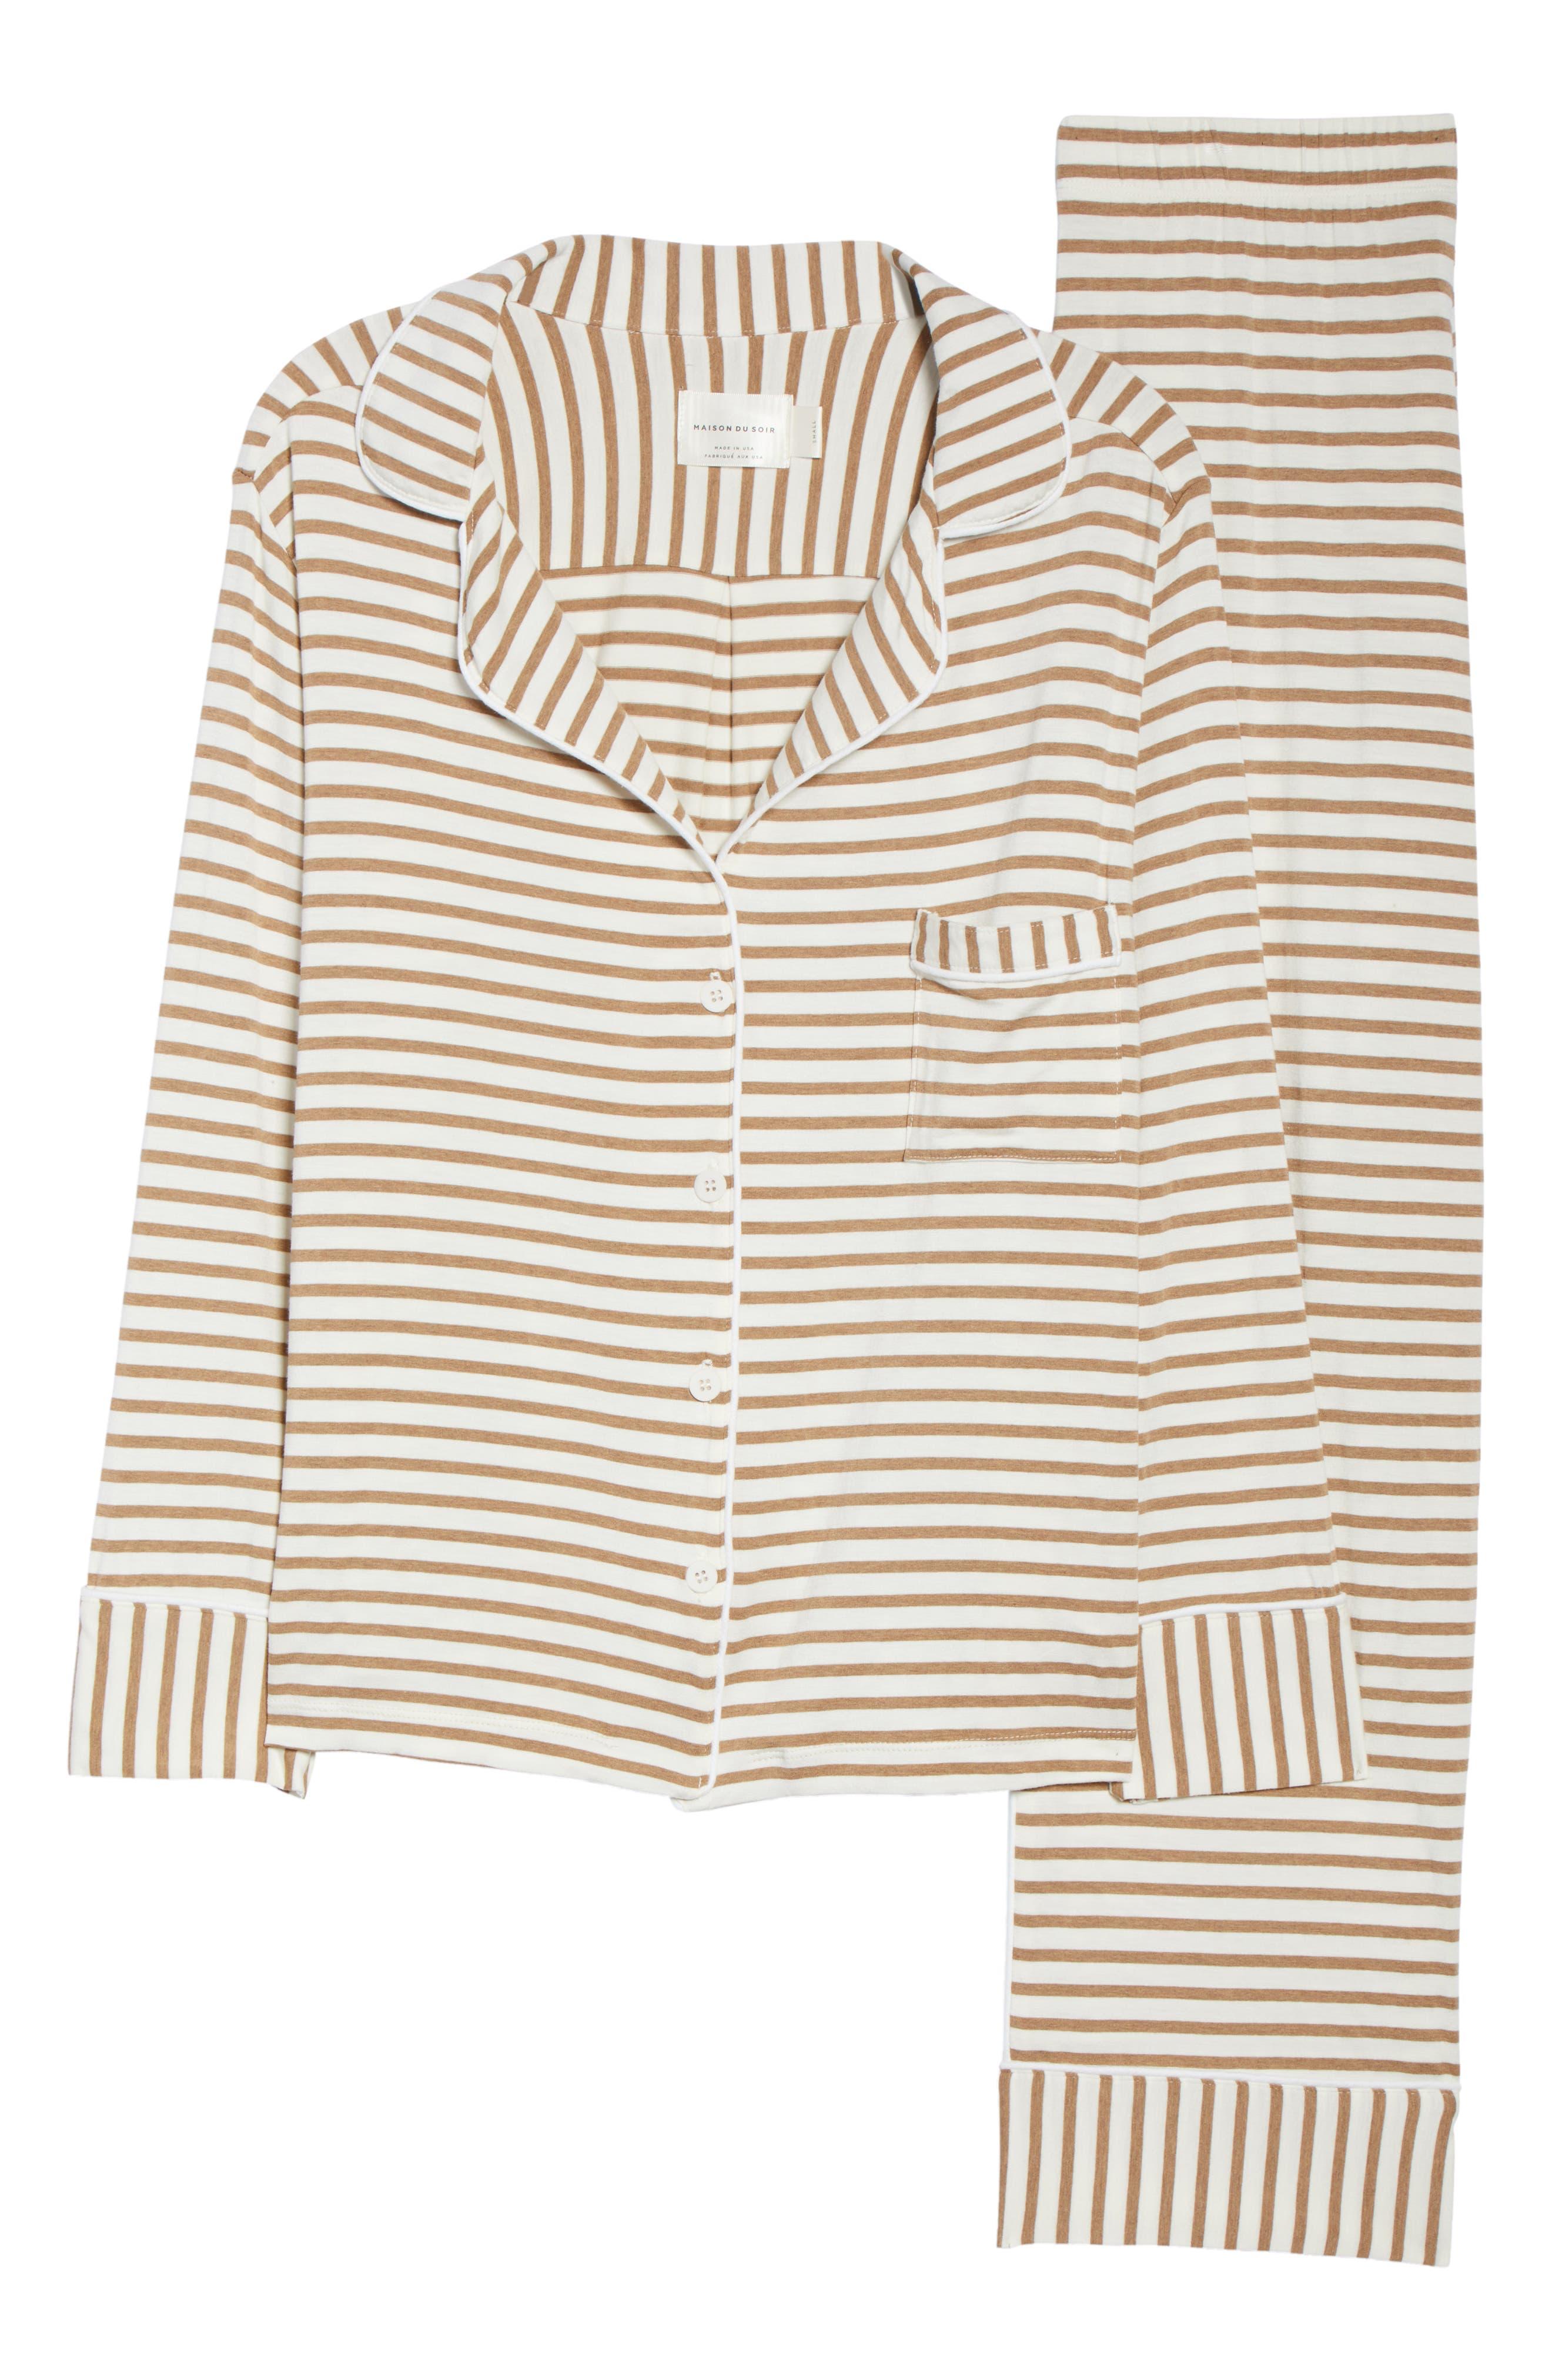 Monaco Pajamas,                             Alternate thumbnail 6, color,                             CAMEL STRIPE